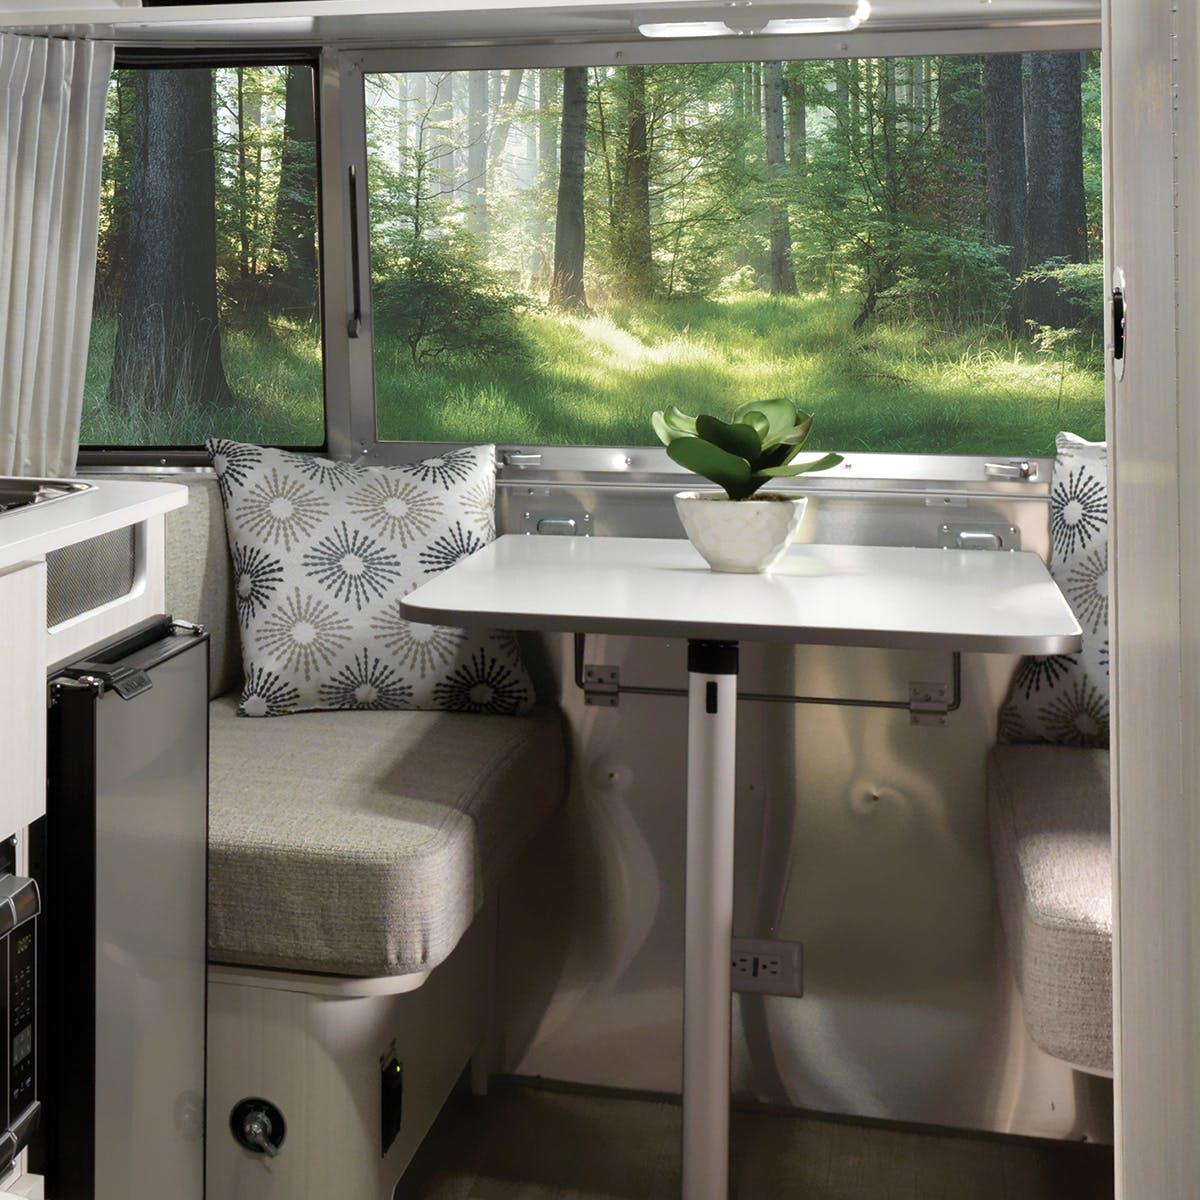 2020 Airstream Bambi 16RB Dune Decor Dinette